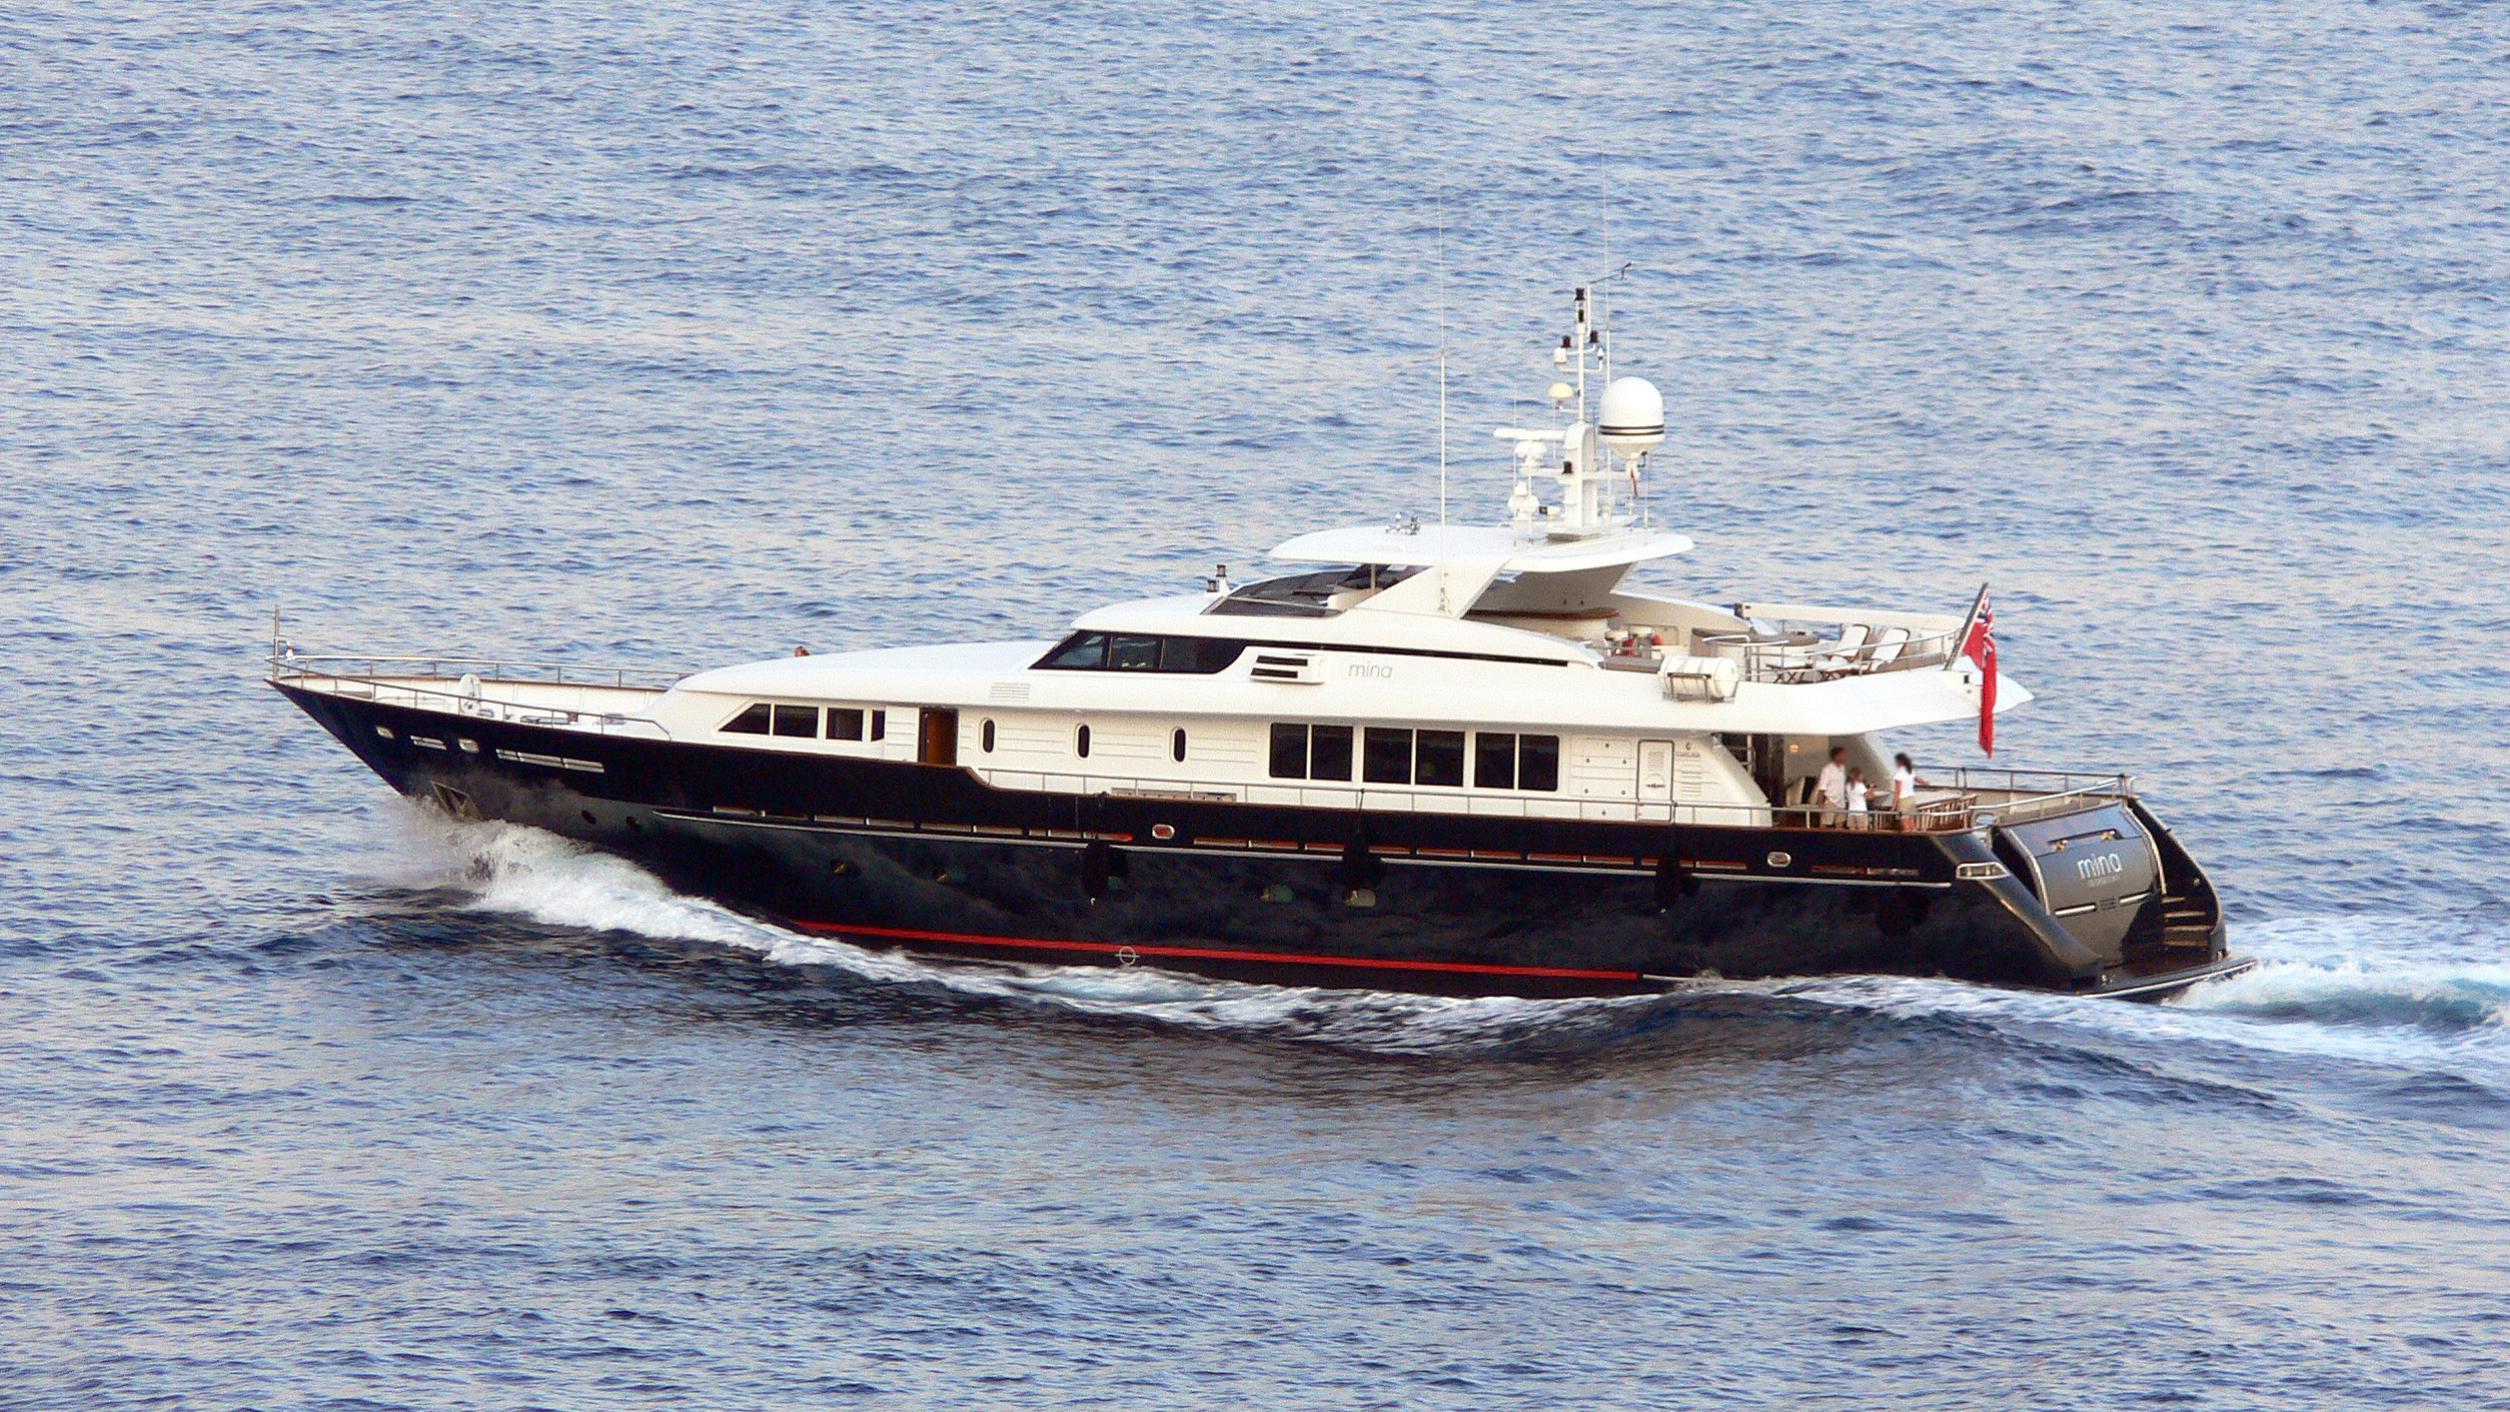 kingfish-mina-motor-yacht-codecasa-2003-35m-half-profile